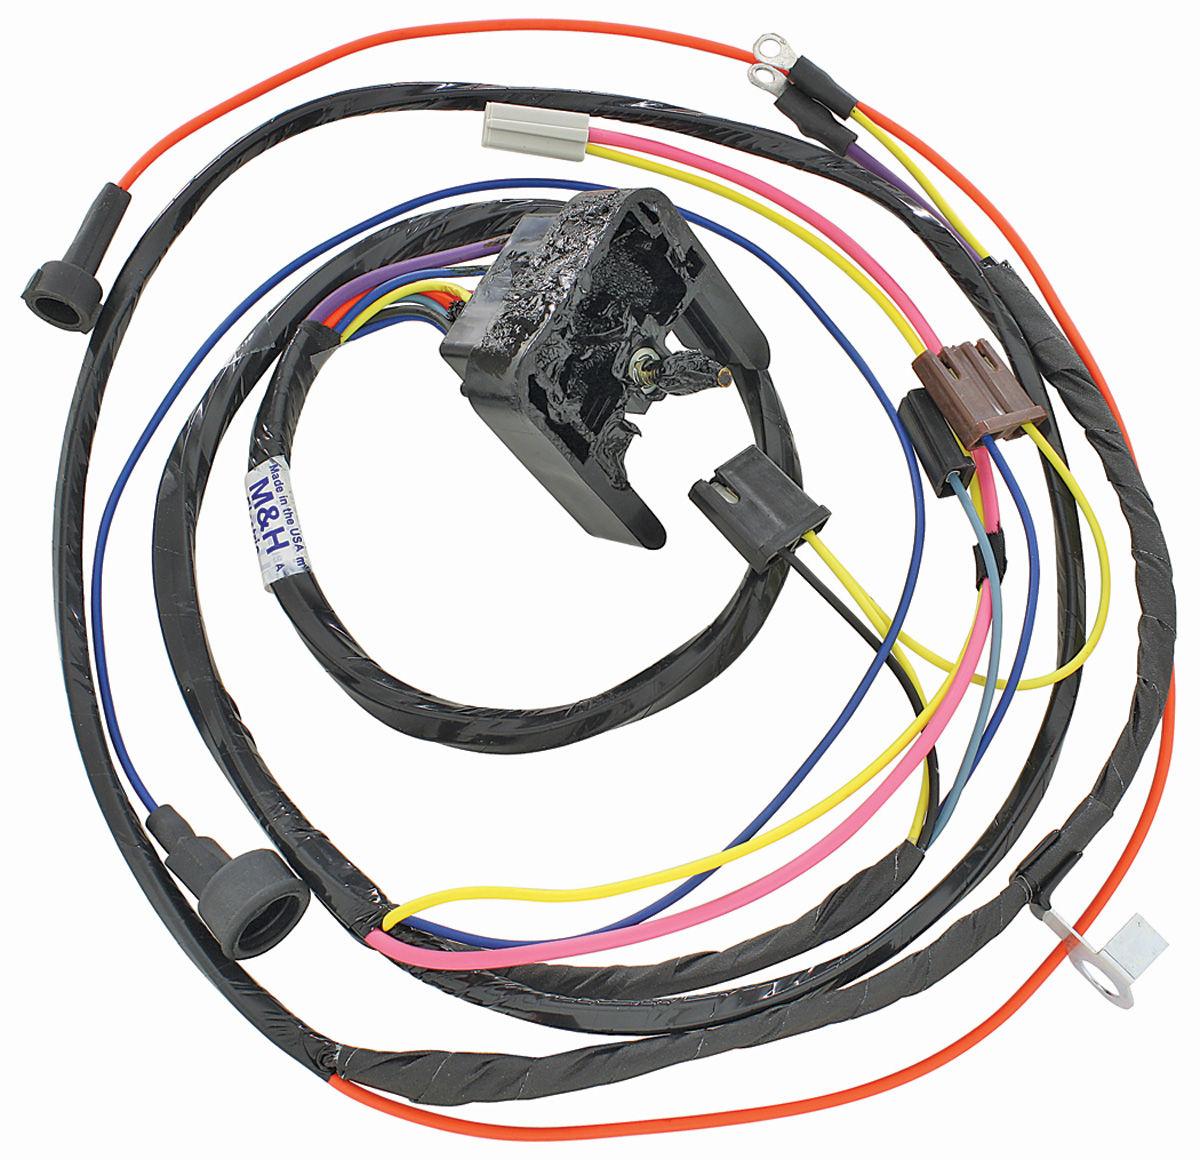 1972 chevelle wire harness diagram wiring diagram